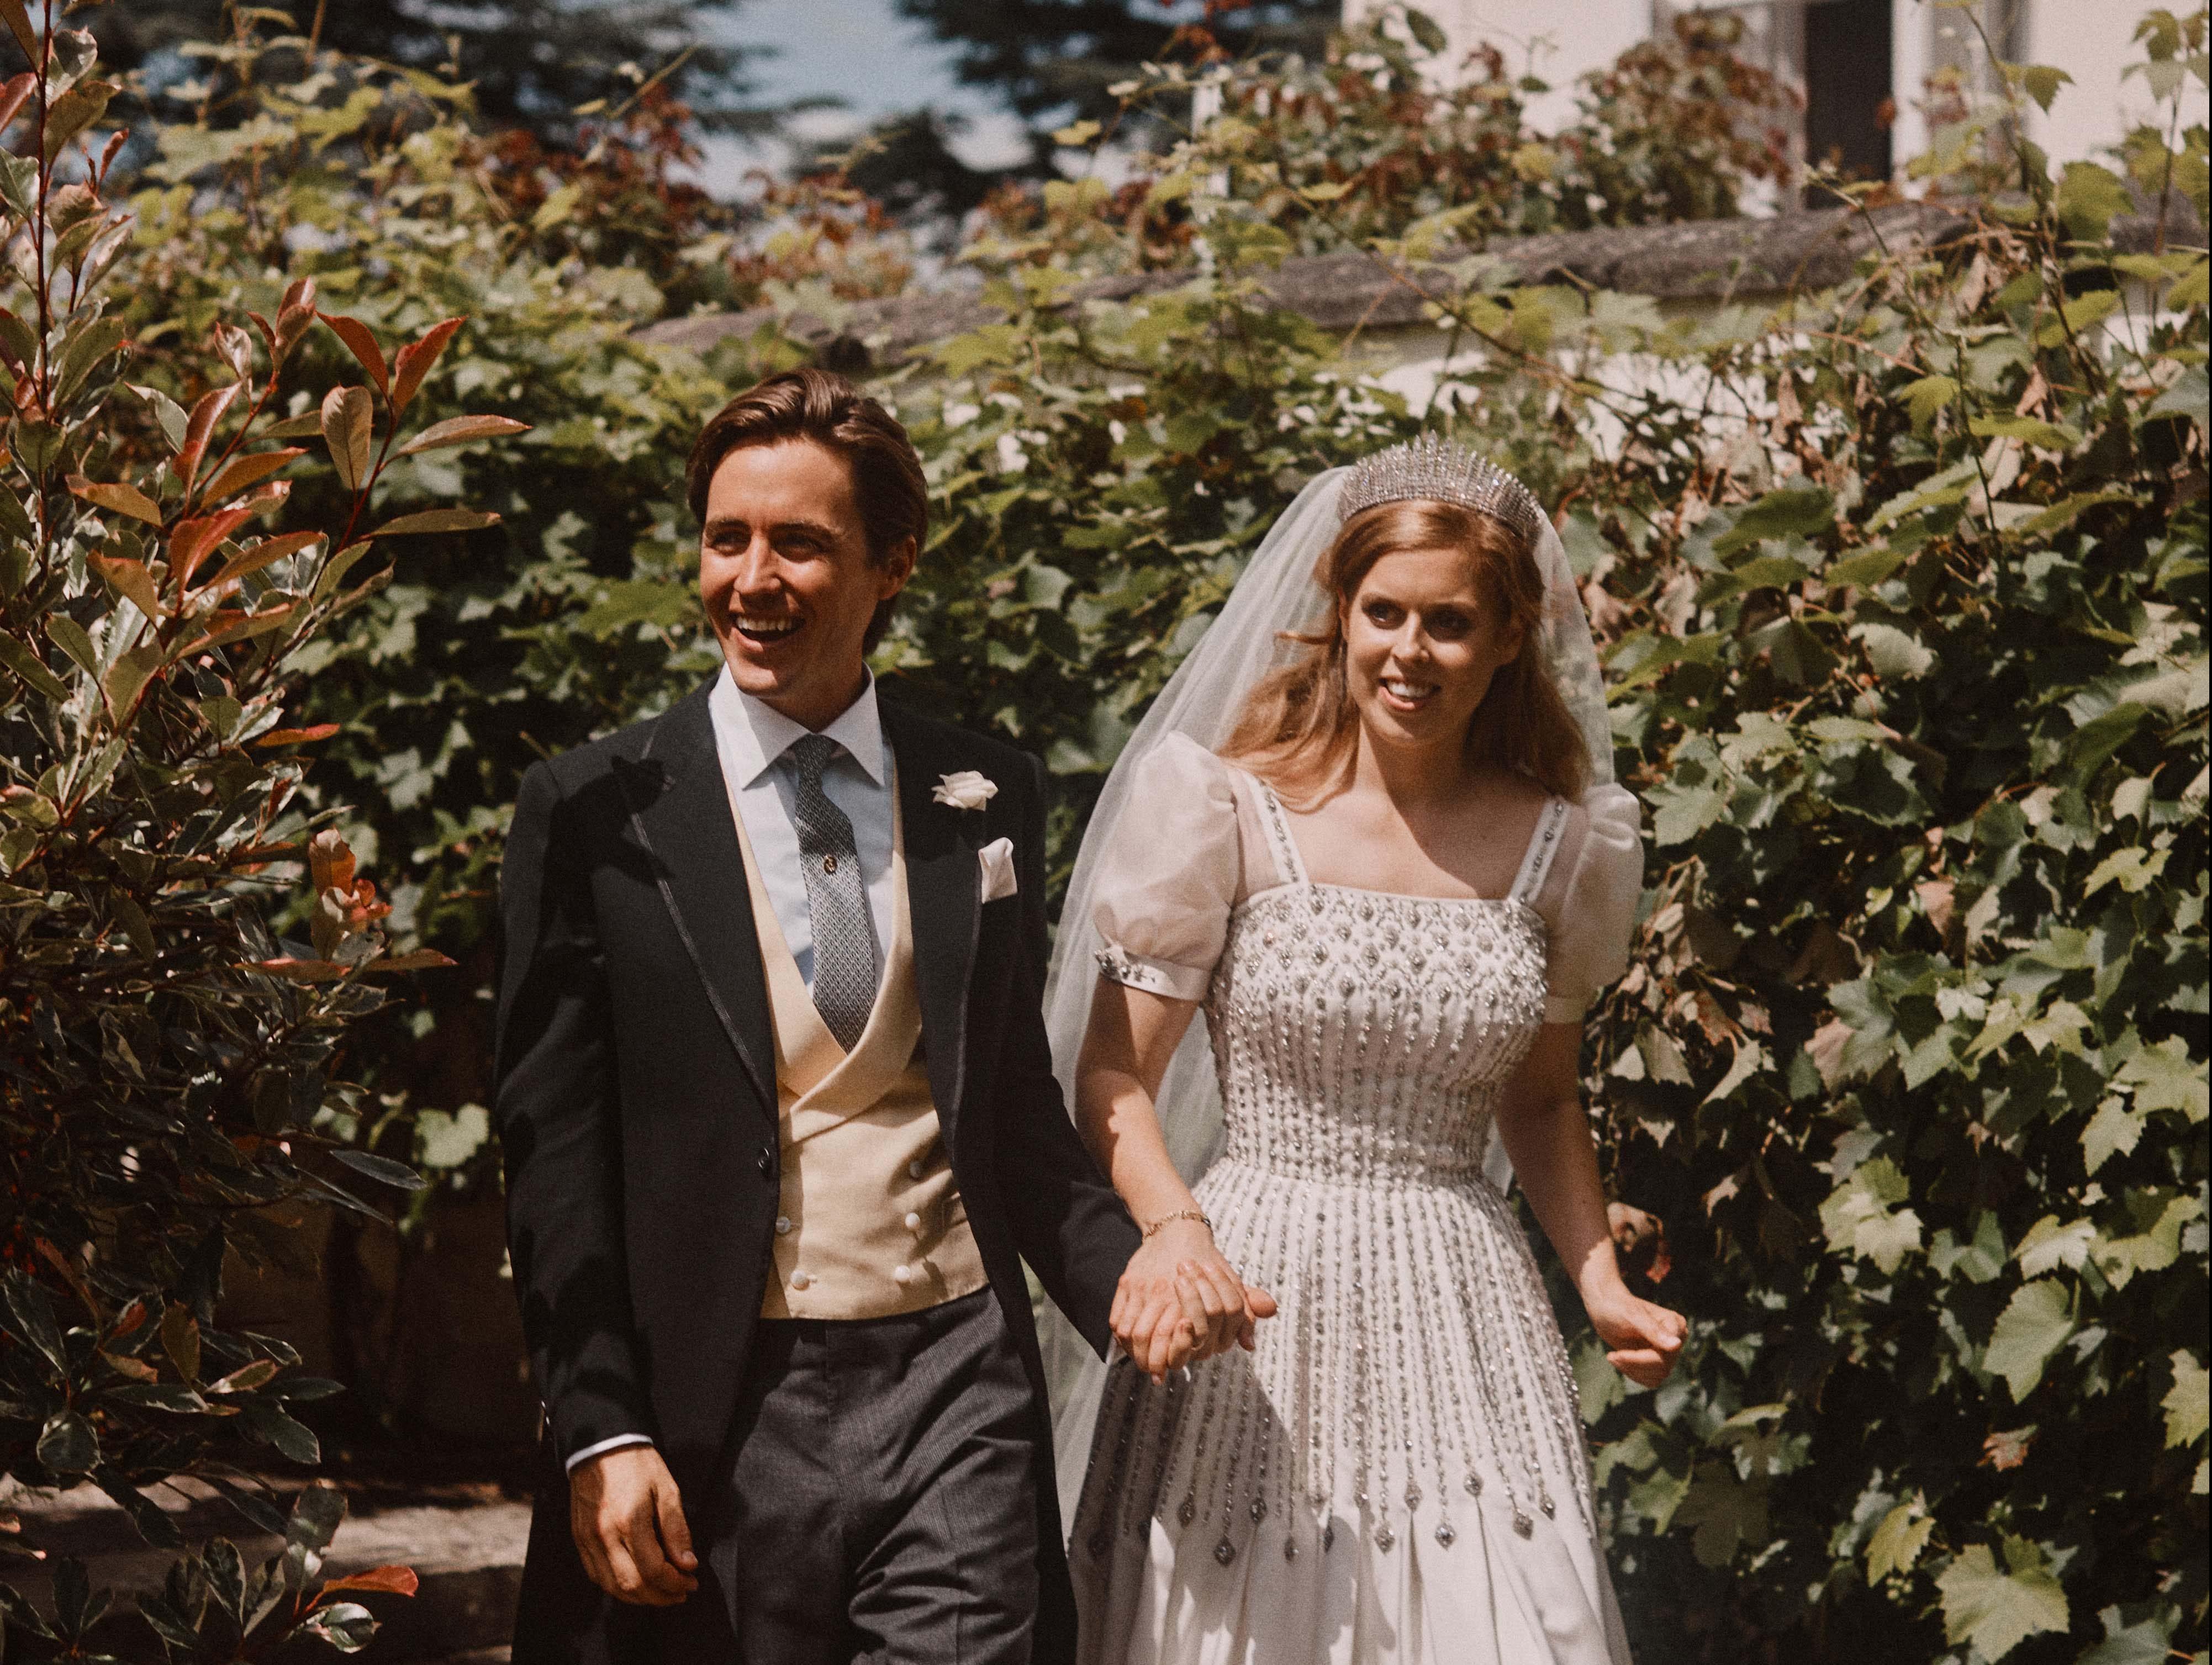 Princess Beatrice and Edoardo Mapelli Mozzi Are on a Low-Key Honeymoon in France